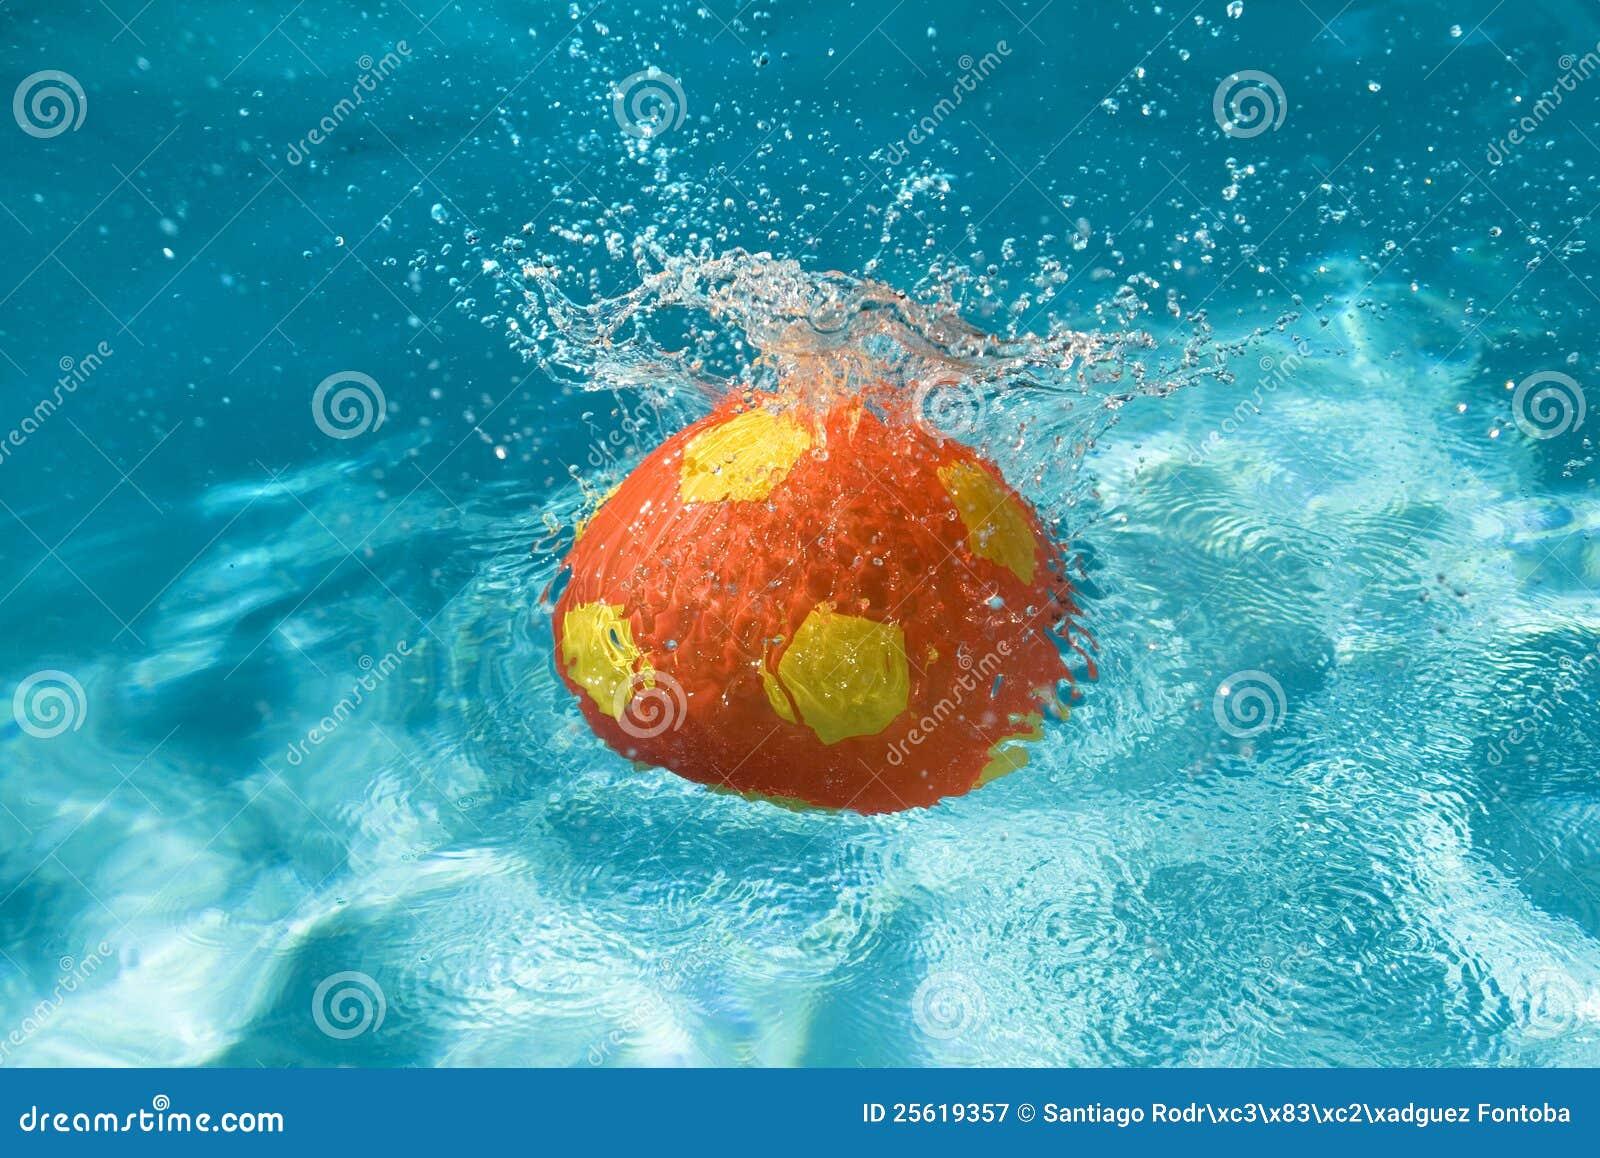 Kugel die im pool spritzt stockbild bild von plastik for Pool plastik